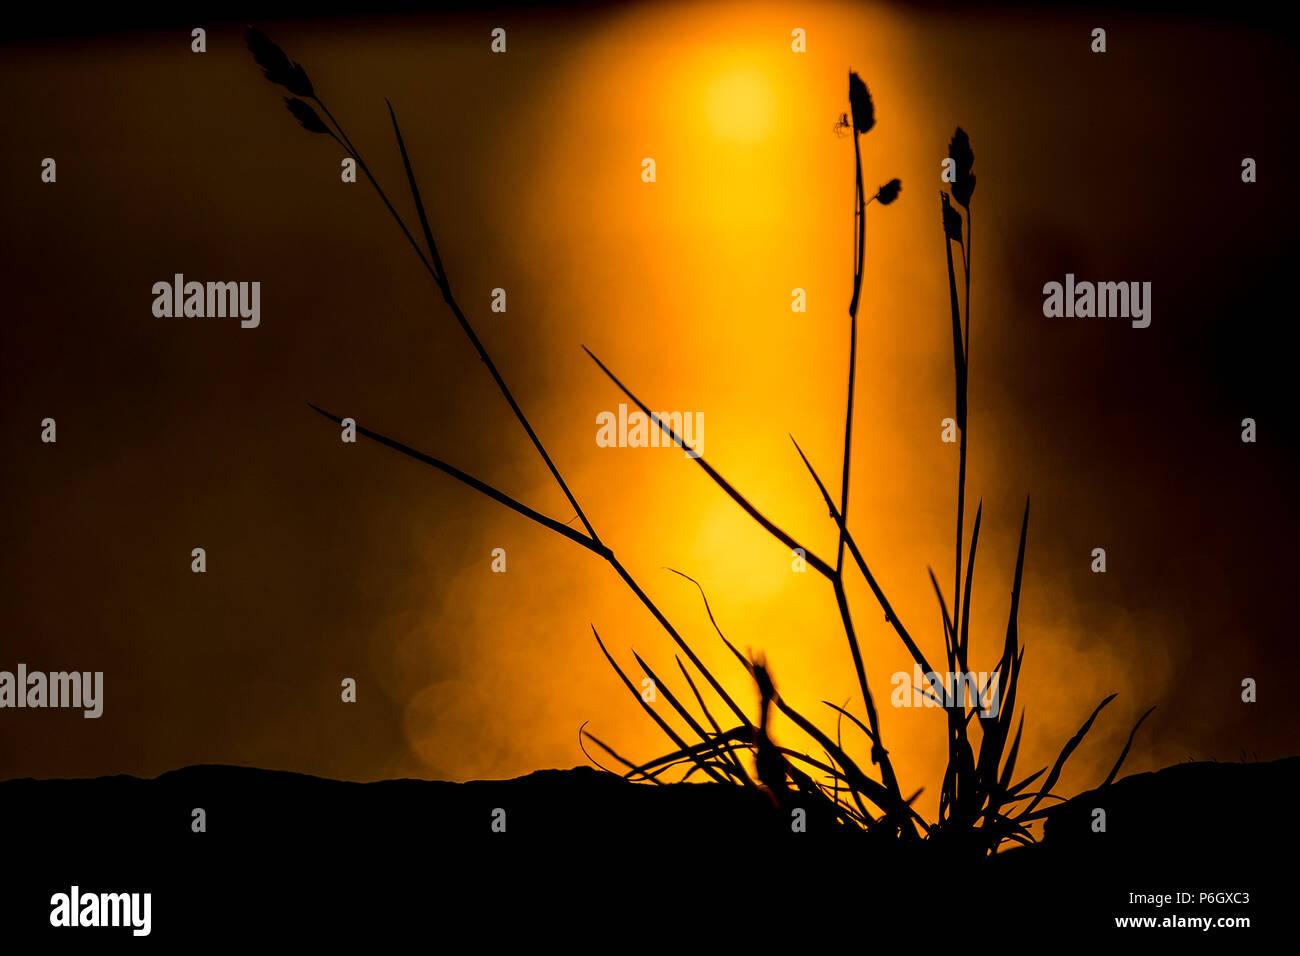 spider on cocksfoot grass at sunset next to winscar reservoir, dunford bridge, peak district - Stock Image